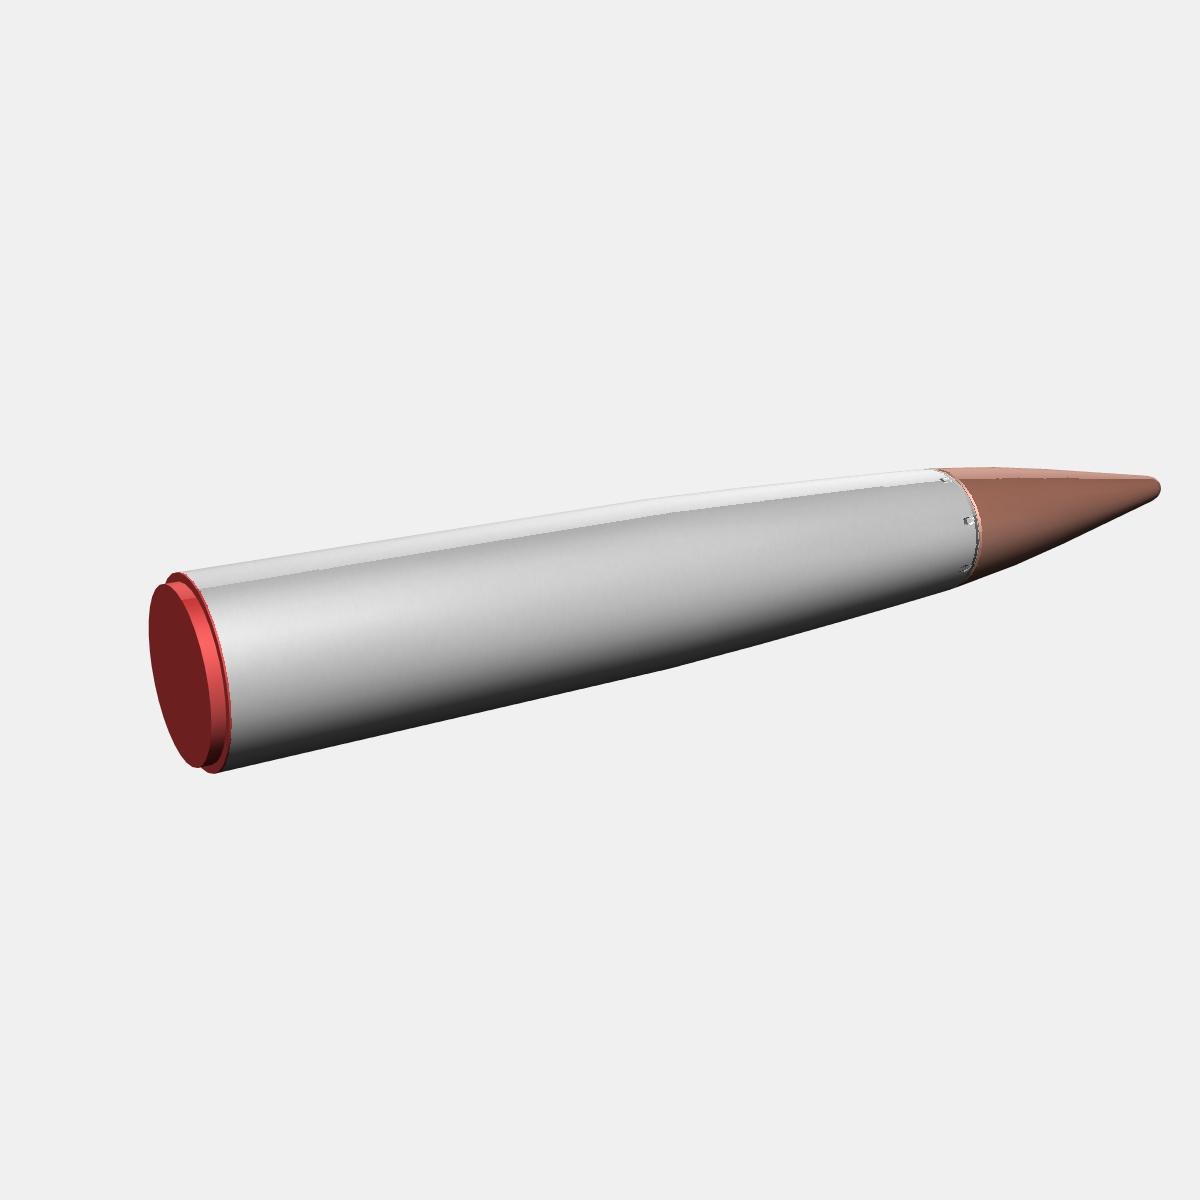 Japanese MT-135 Rocket 3d model 3ds dxf fbx blend cob dae X  obj 158754